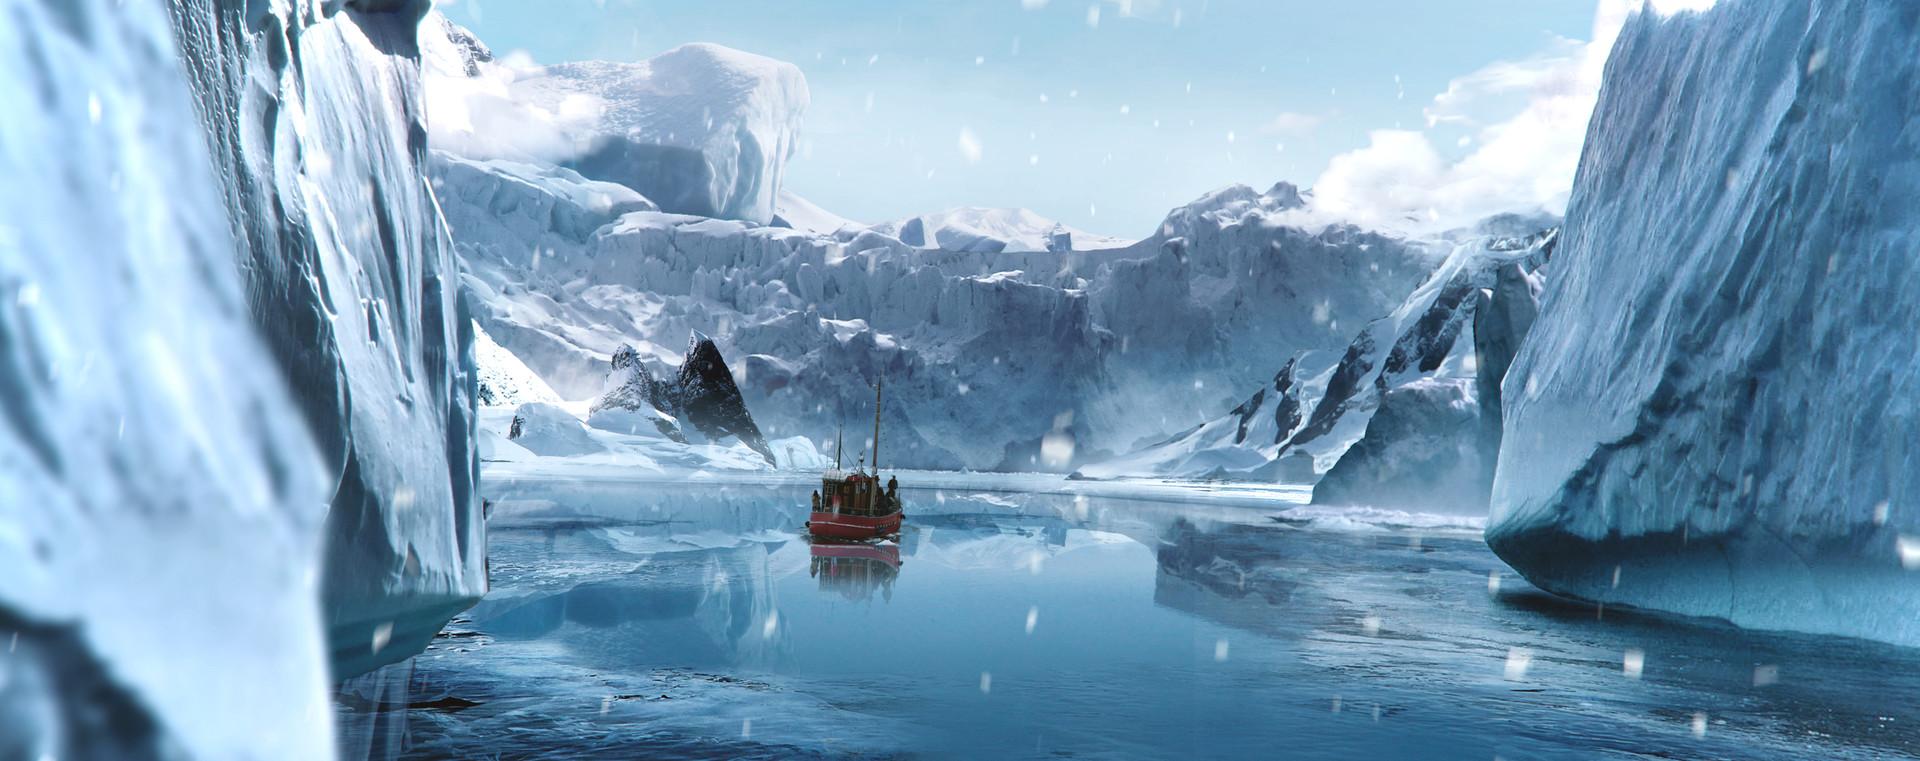 Michael morris glacier